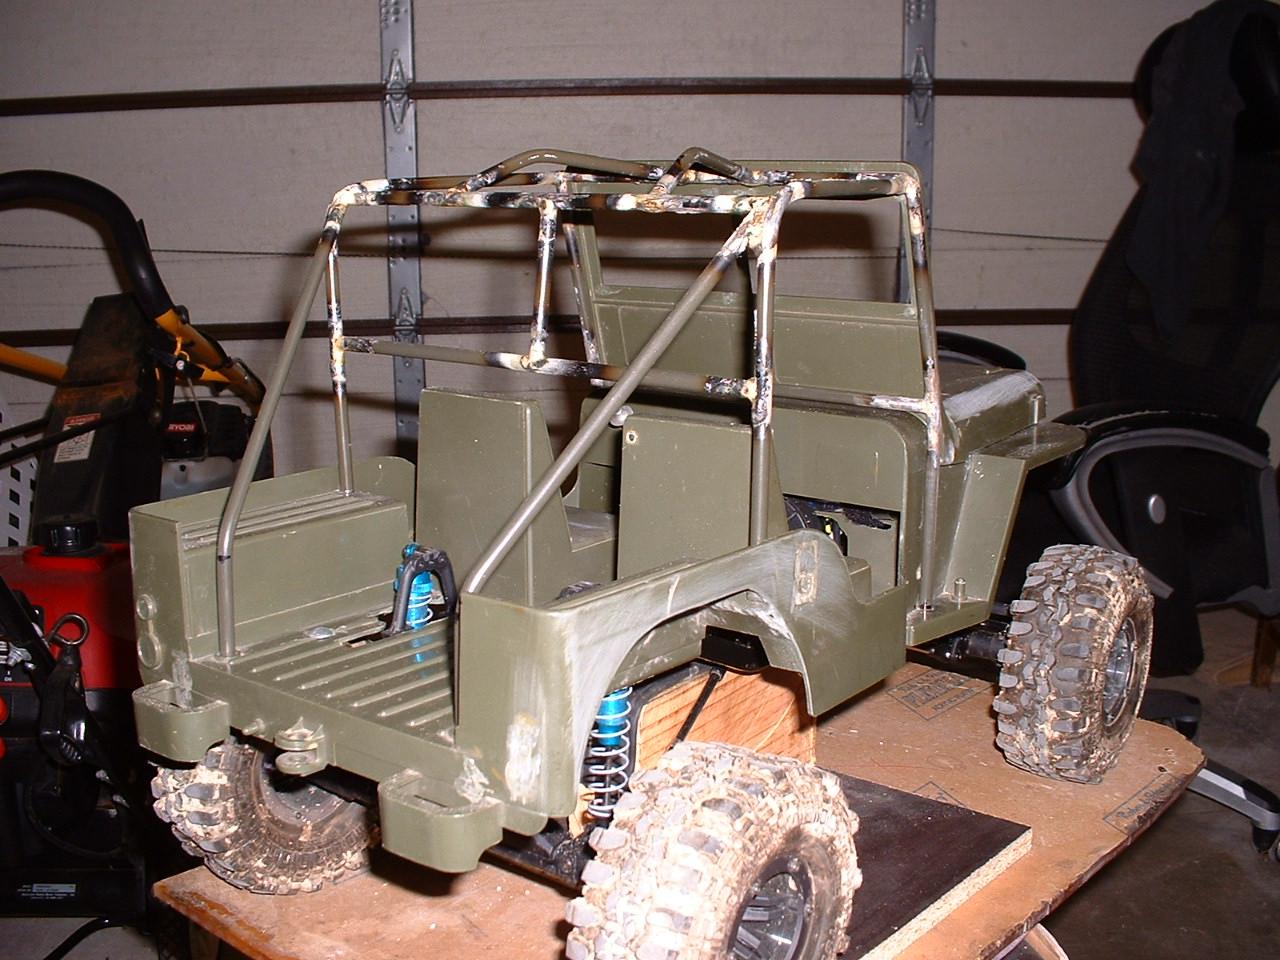 Click image for larger version  Name:GI Joe Jeep 5b 001.JPG Views:1322 Size:329.3 KB ID:2040907